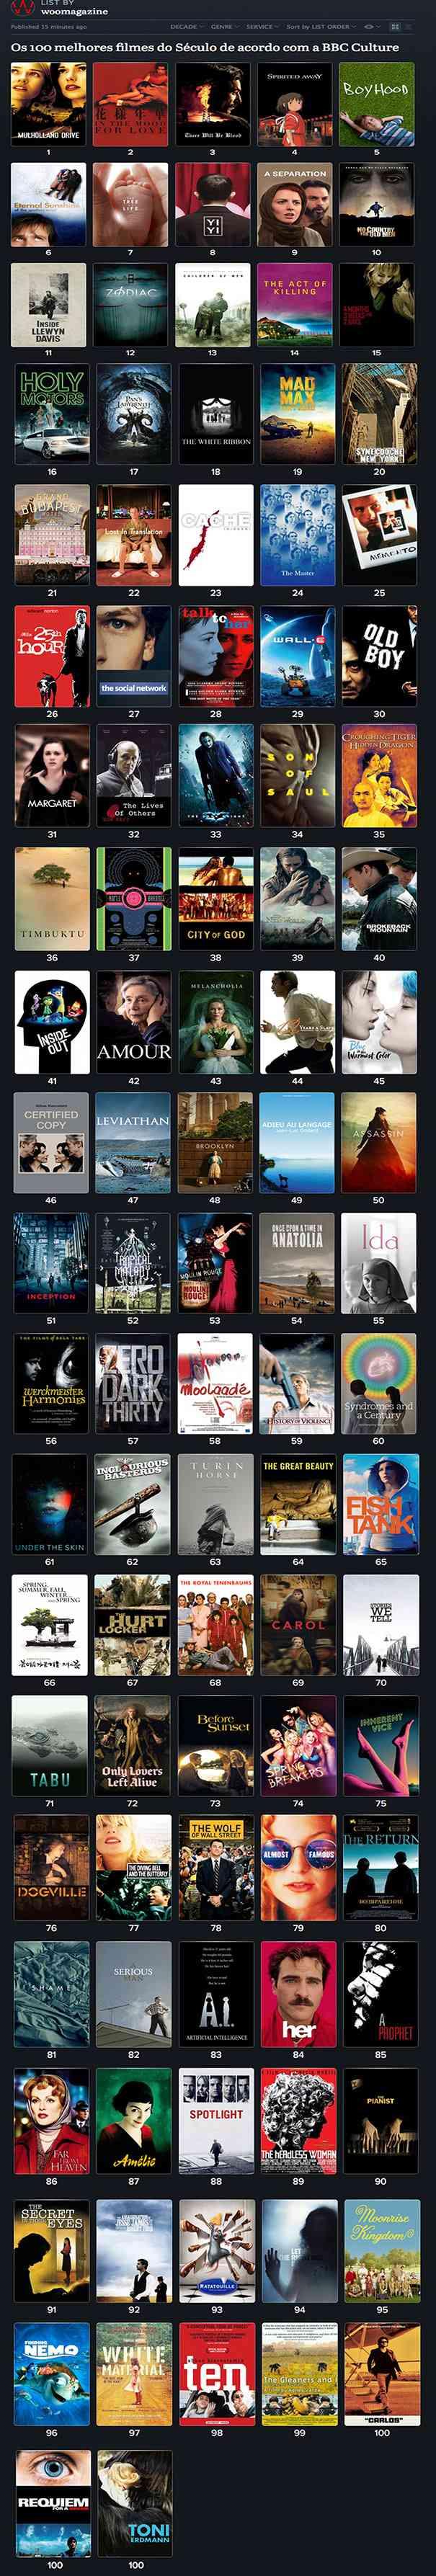 Filmes Top 100